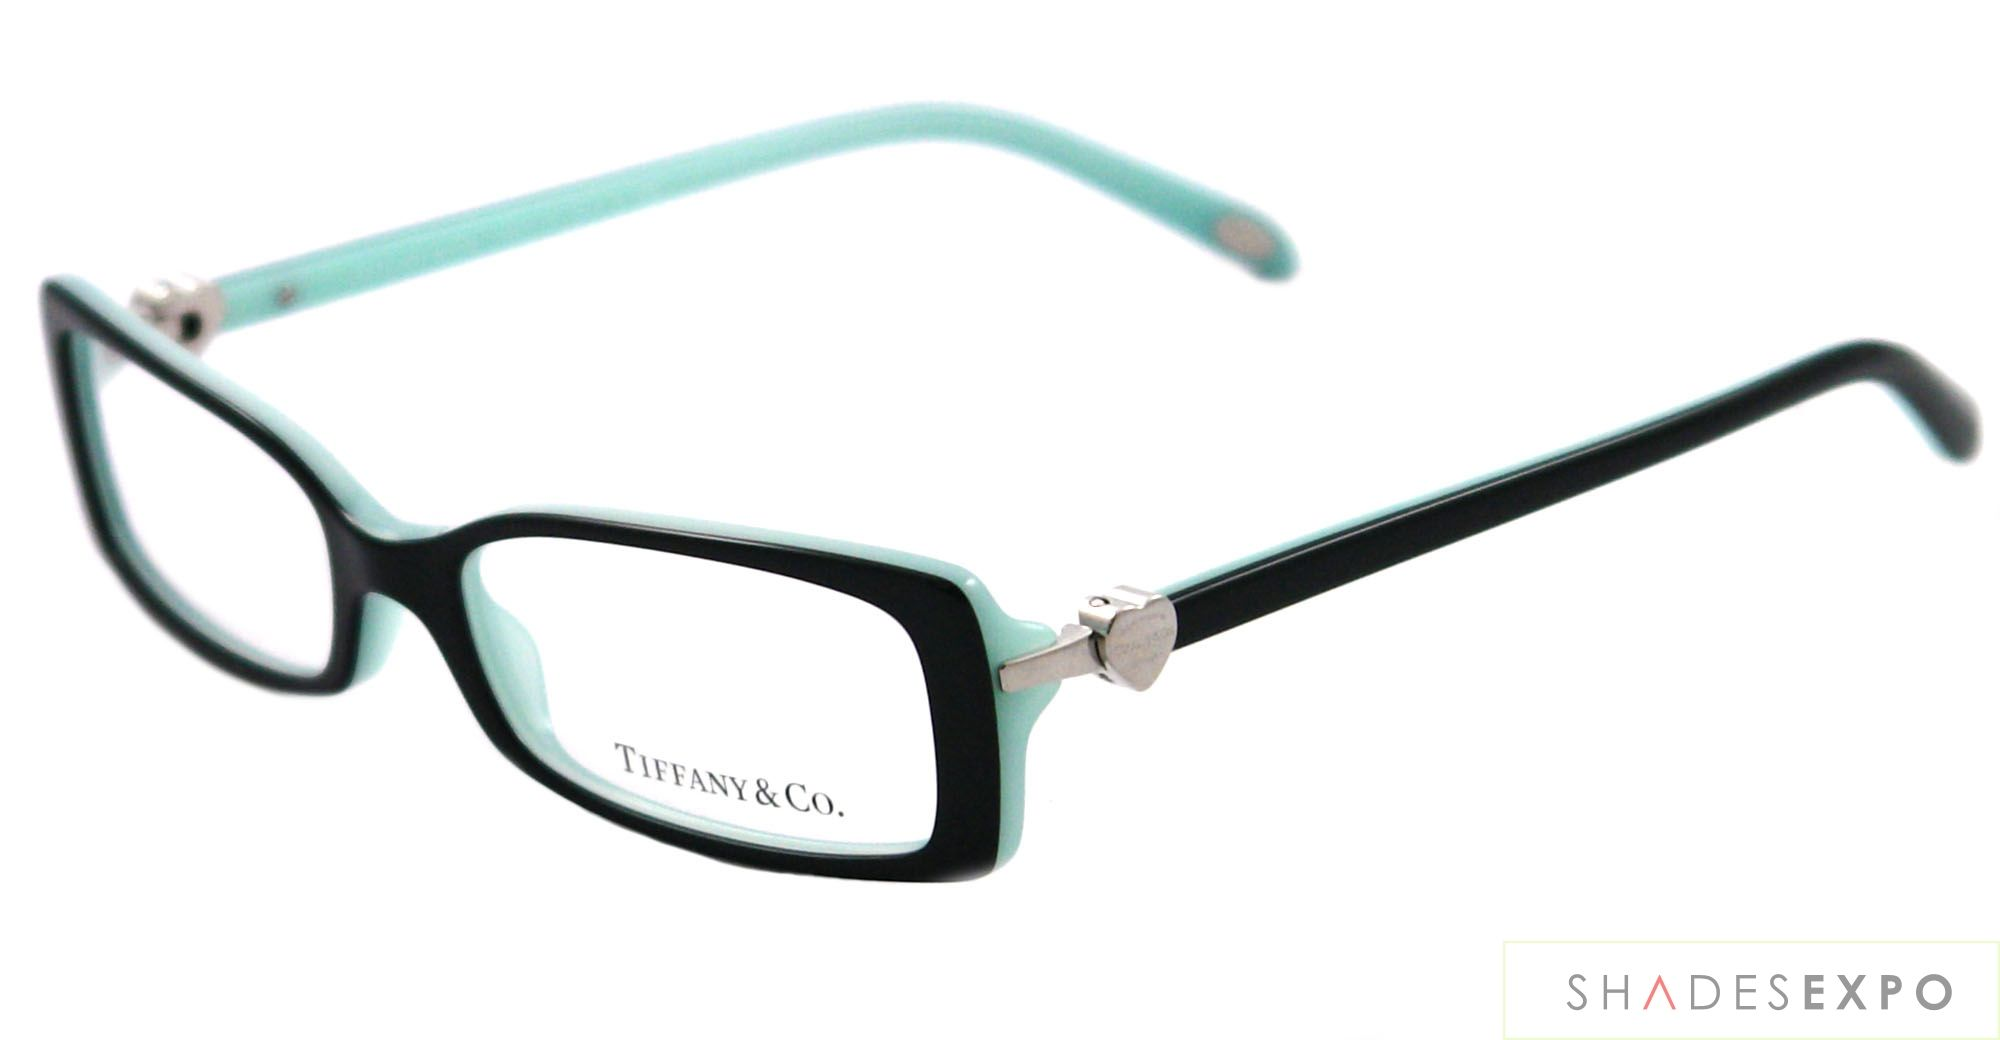 NEW Tiffany Eyeglasses TIF 2035 BLUE 8055 50MM AUTH   My Style ...